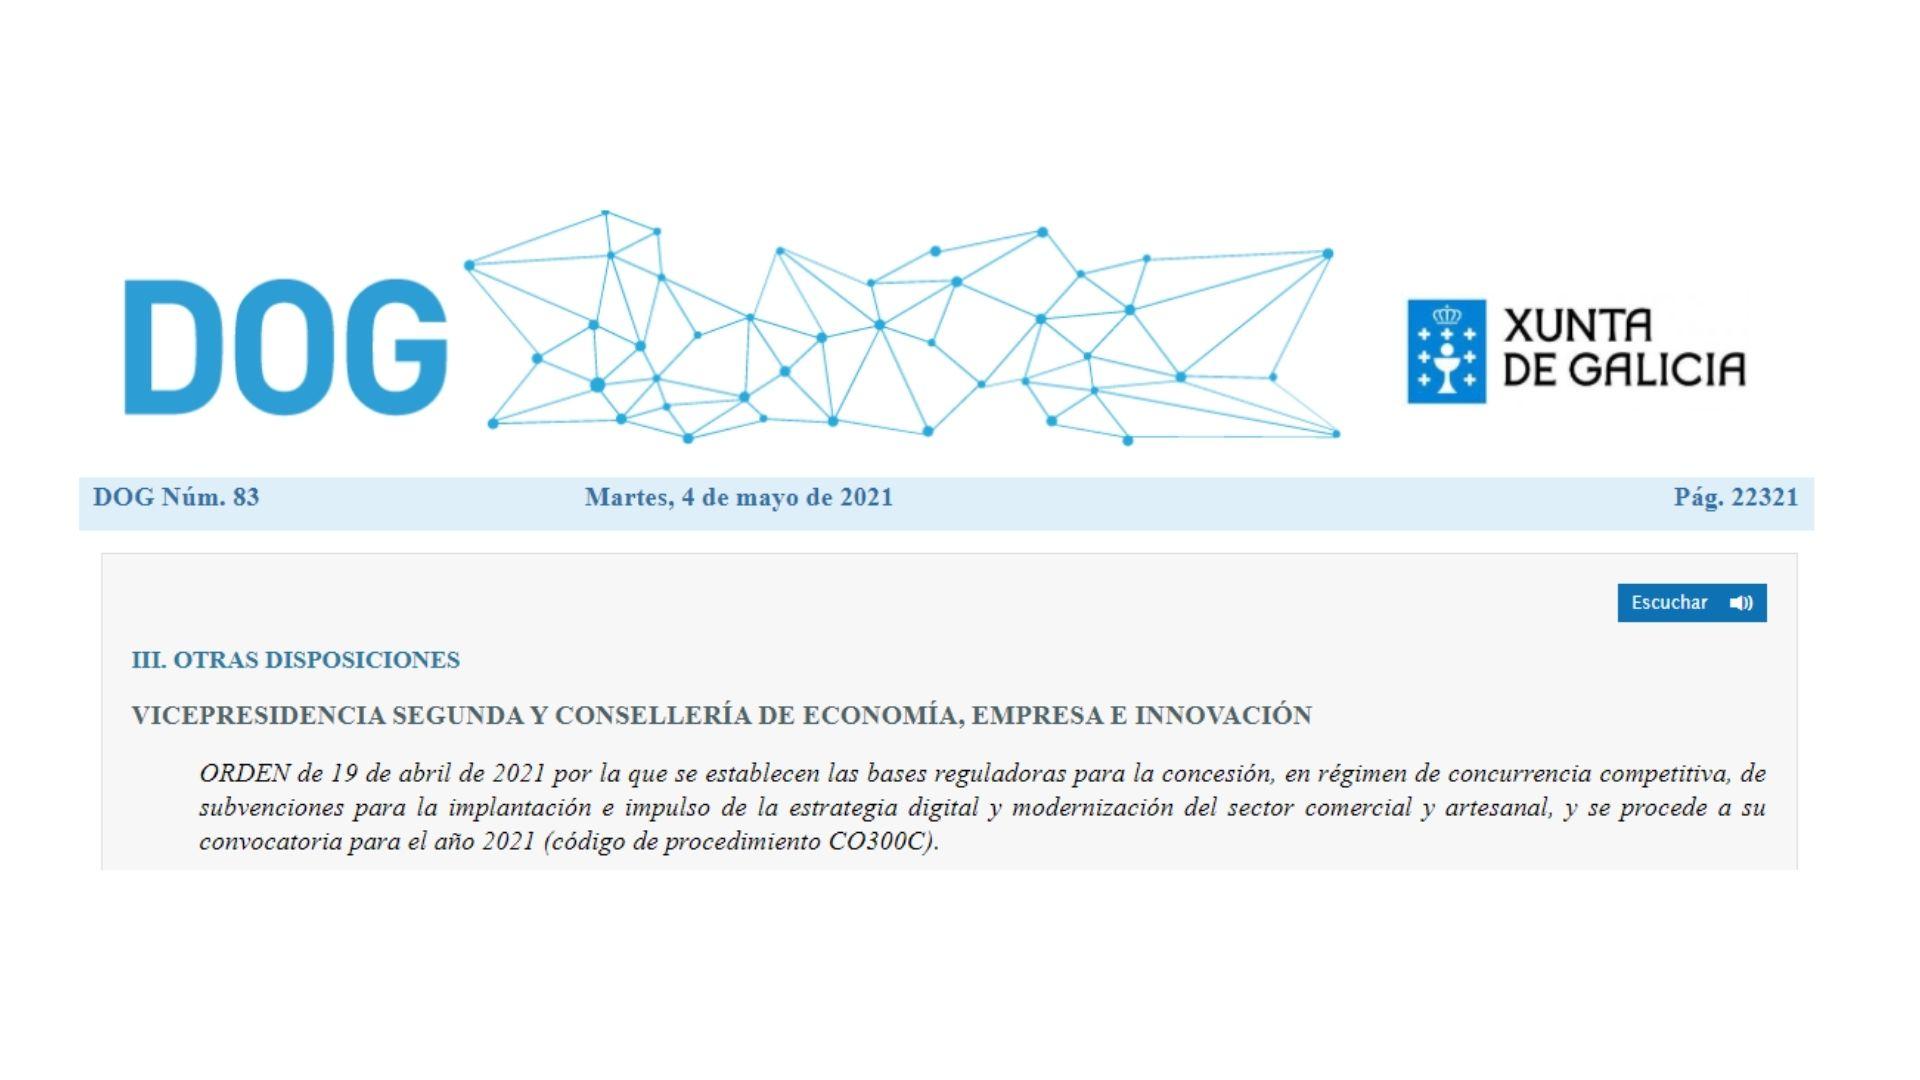 subvenciones-estrategia-digital-sector-comercial-artesanal-2021